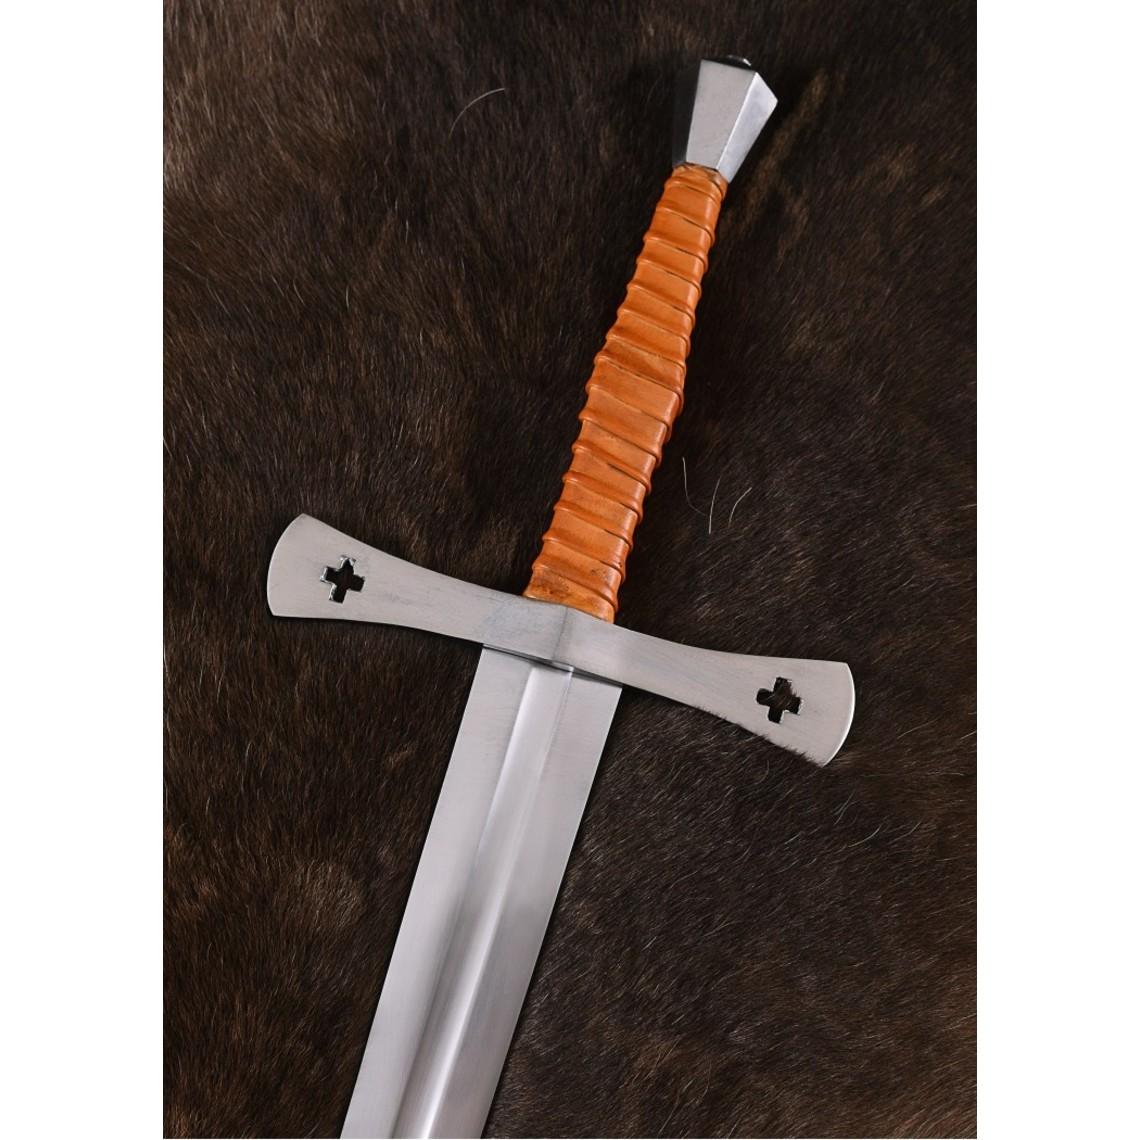 Deepeeka 15th century hand-and-a-half sword Shrewsbury, battle-ready